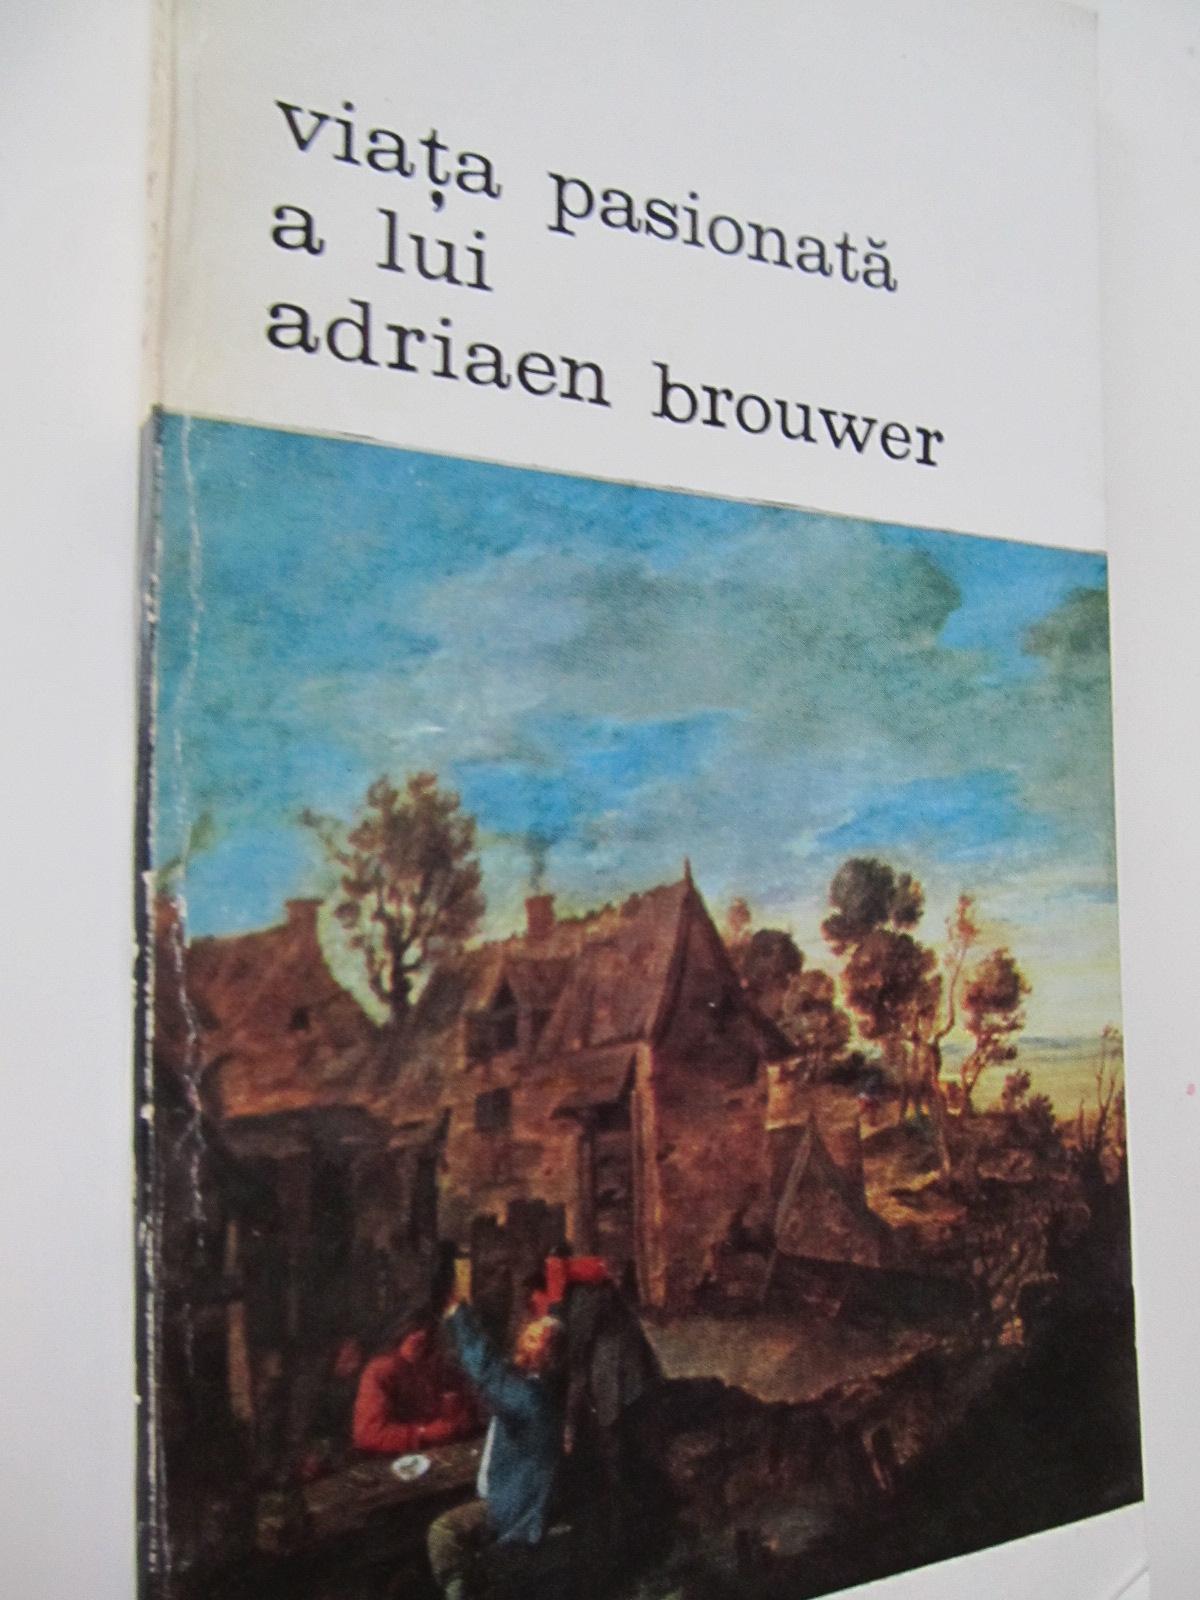 Viata pasionata a lui Adriaen Brouwer - Felix Timmermans | Detalii carte